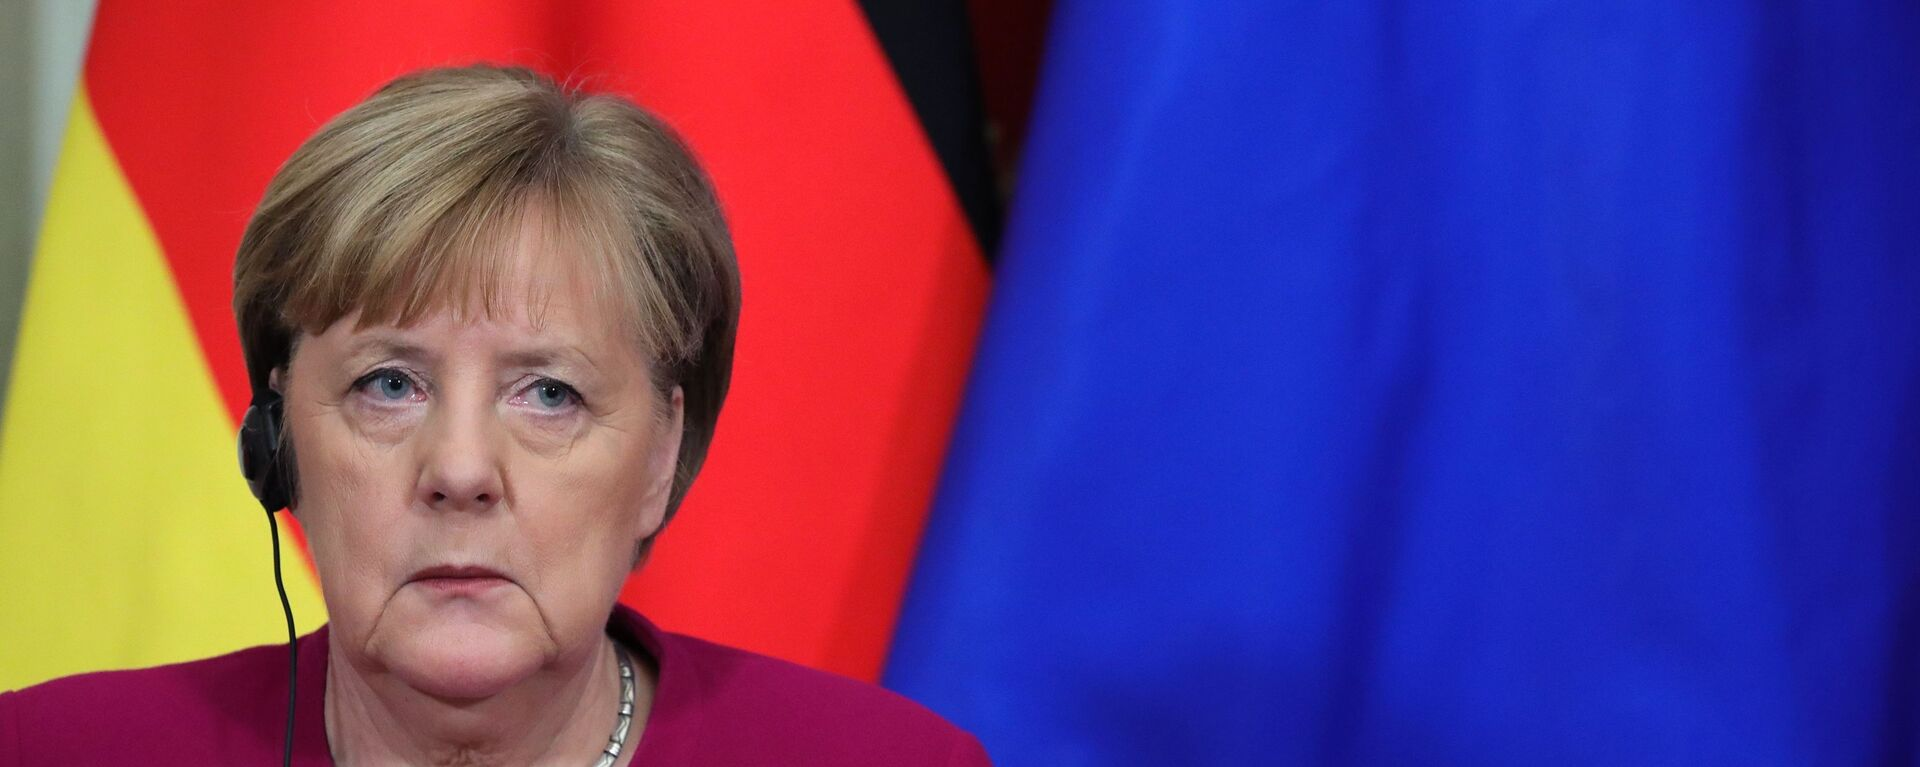 Angela Merkel - Sputnik Polska, 1920, 08.05.2021